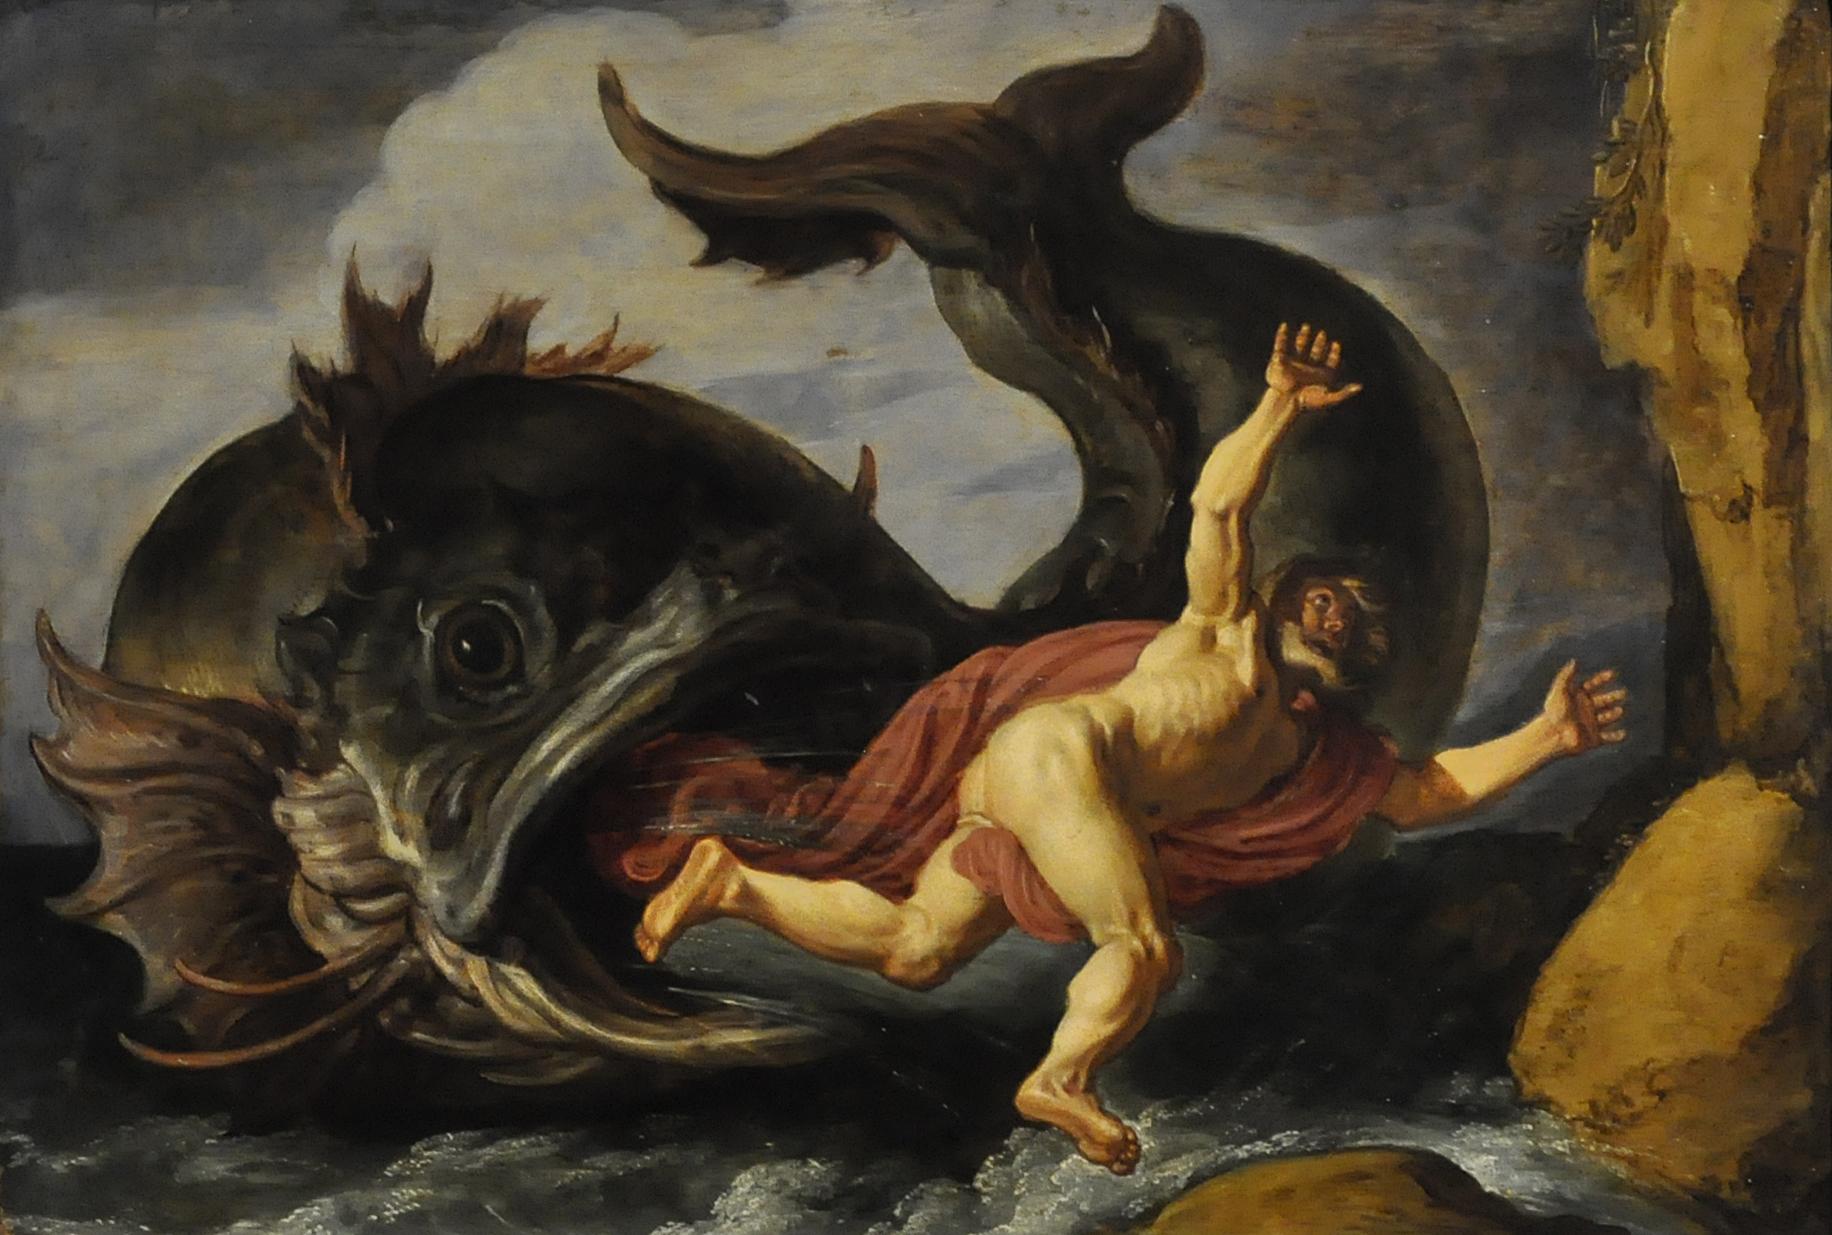 File:Pieter Lastman (1583-1633) - Jonas en de walvis (1621